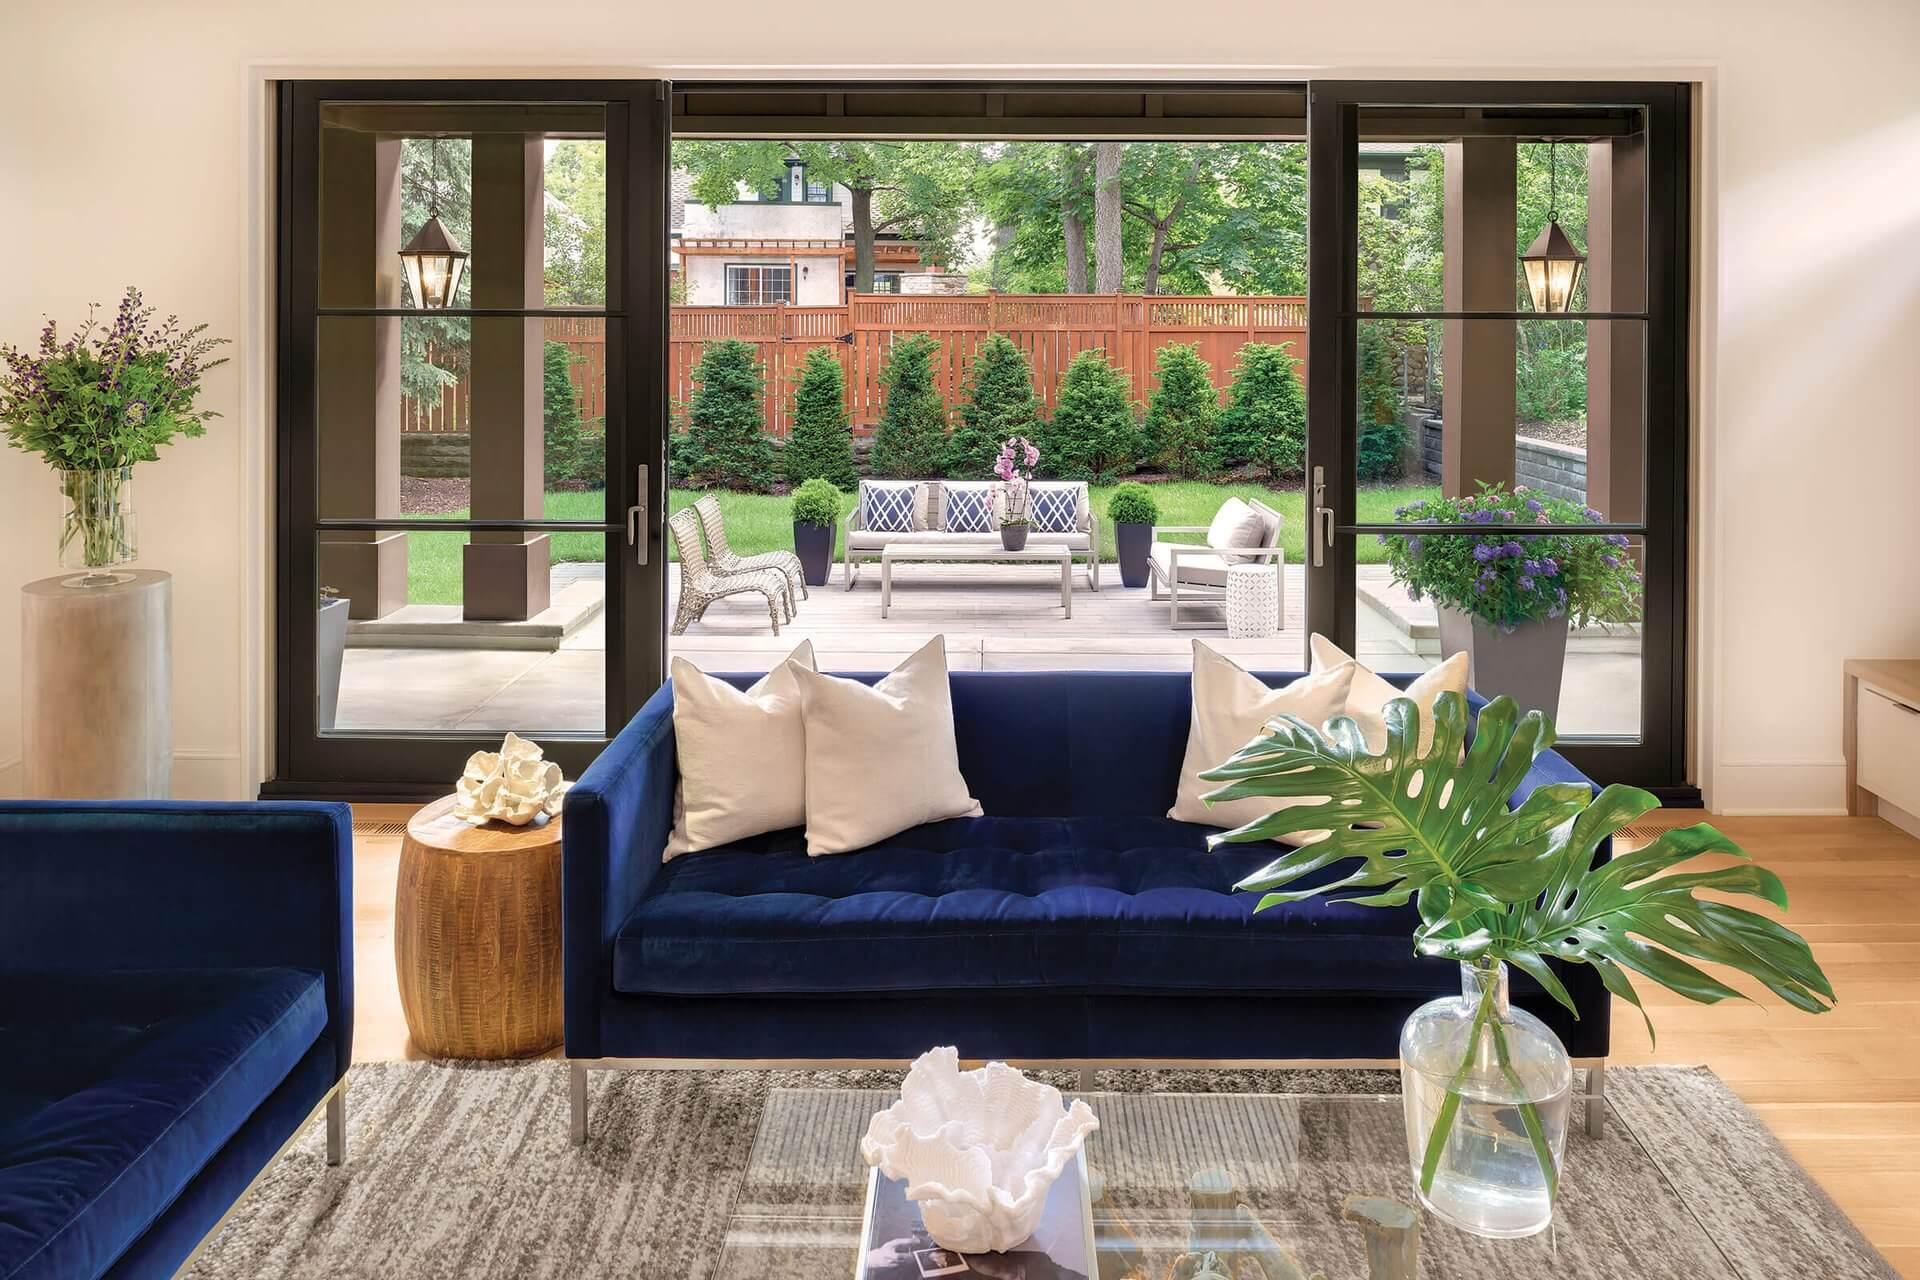 elevate-sliding-french-door-1-luxury-home-tour